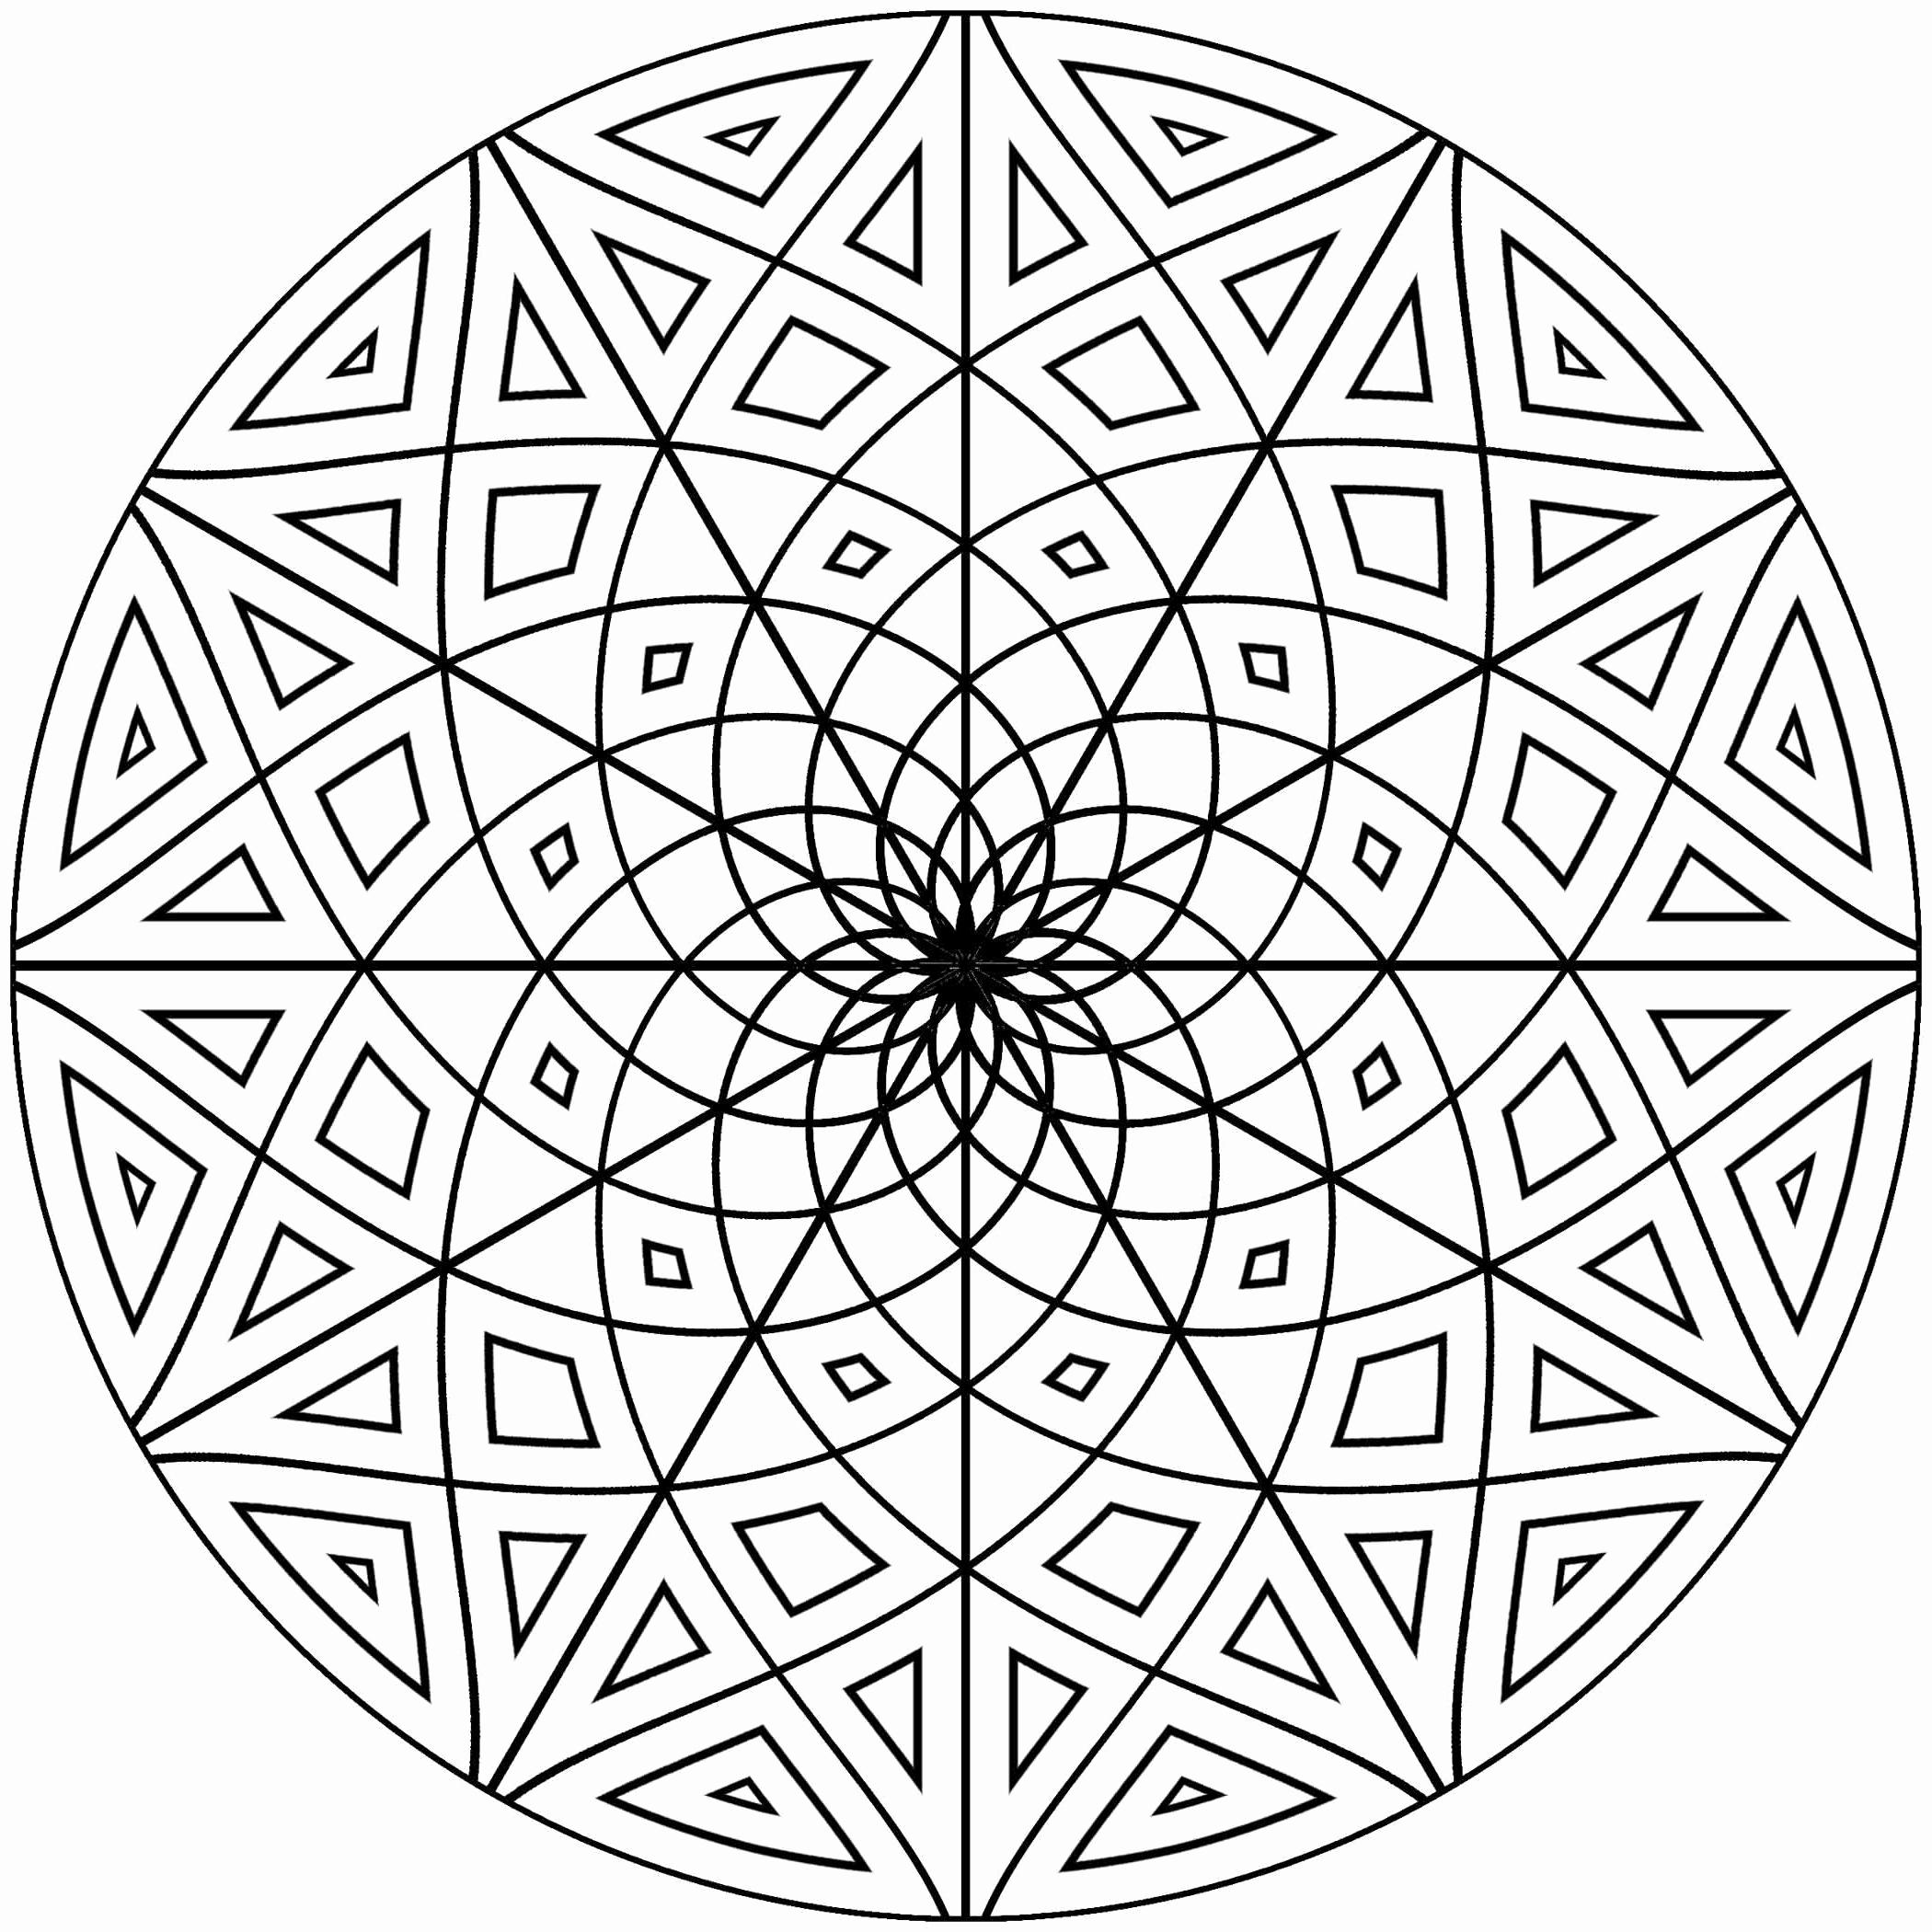 Geometric Shape Pattern Worksheets Unique 15 Best Of Geometry Drawing Worksheets Printable